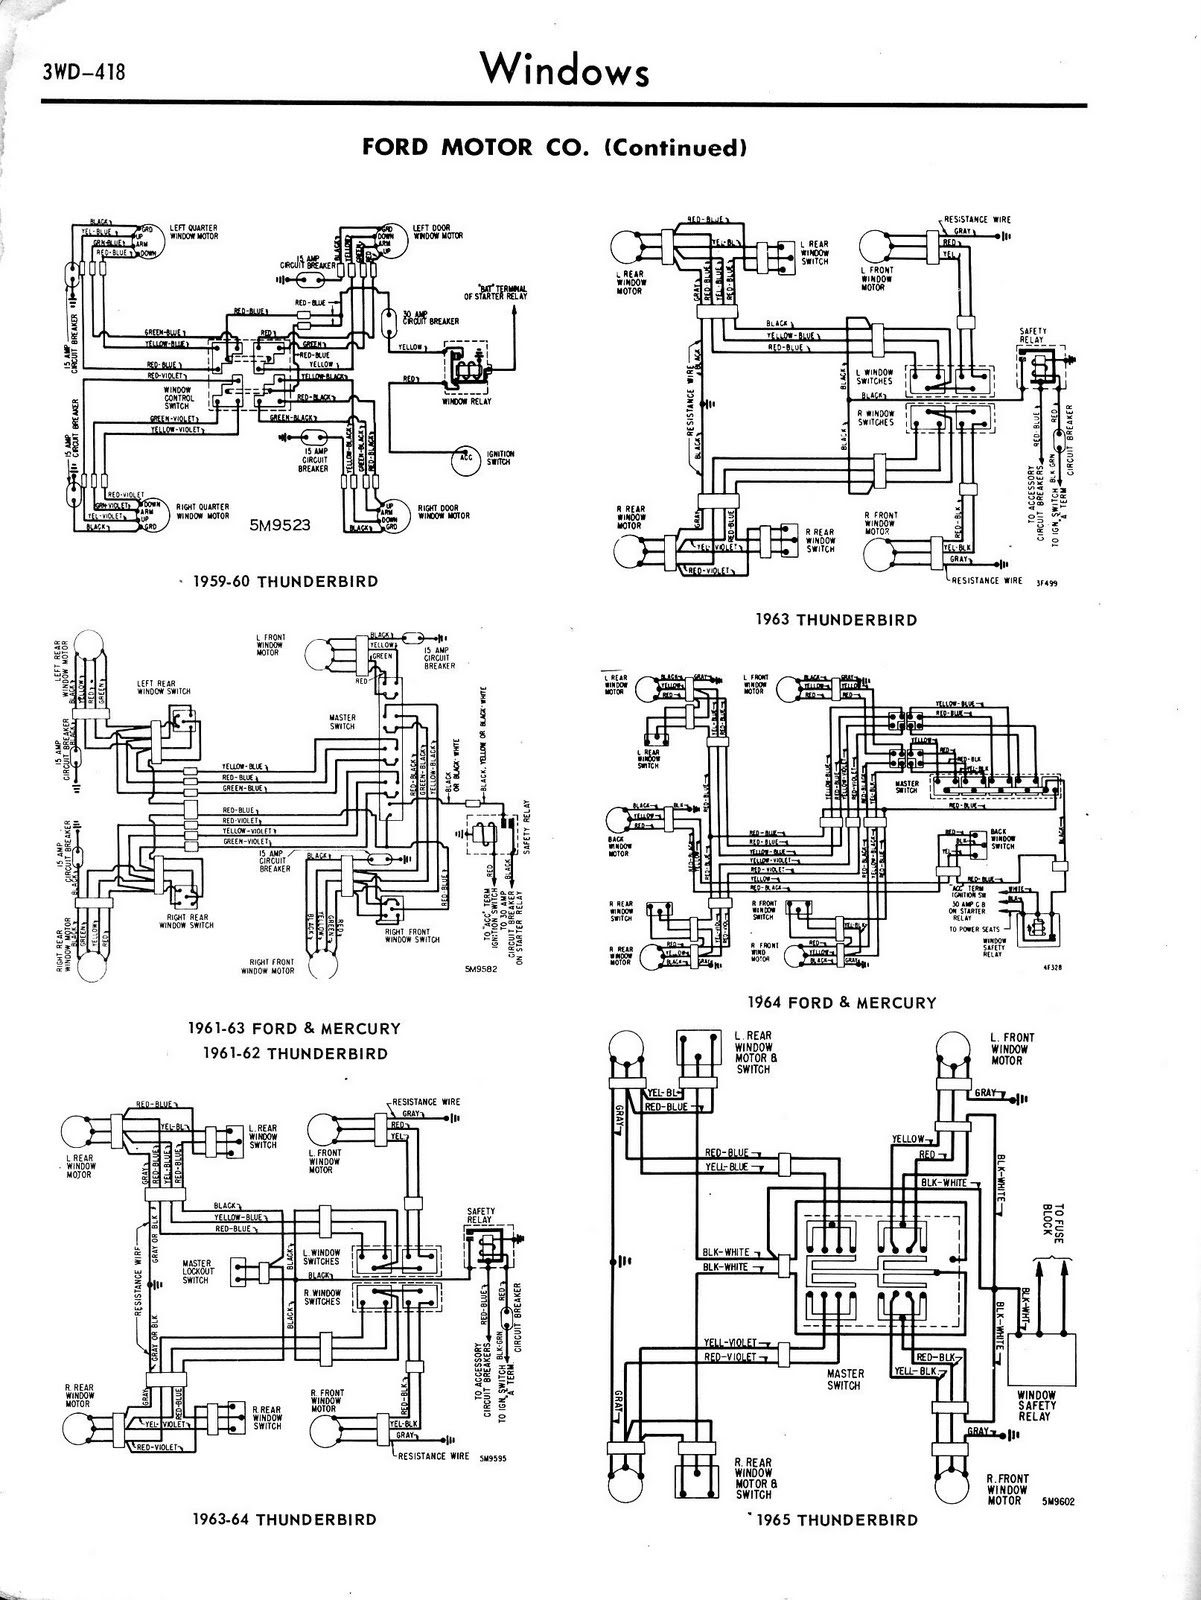 1966 Thunderbird Fuse Box Automotive Wiring Diagram. 97 Thunderbird Fuse Box Wiring Library Rh 86 Muehlwald De 1966 Ford 1965. Chevrolet. 1997 Chevy Silverado Wiring Diagram For Electric Windows At Scoala.co